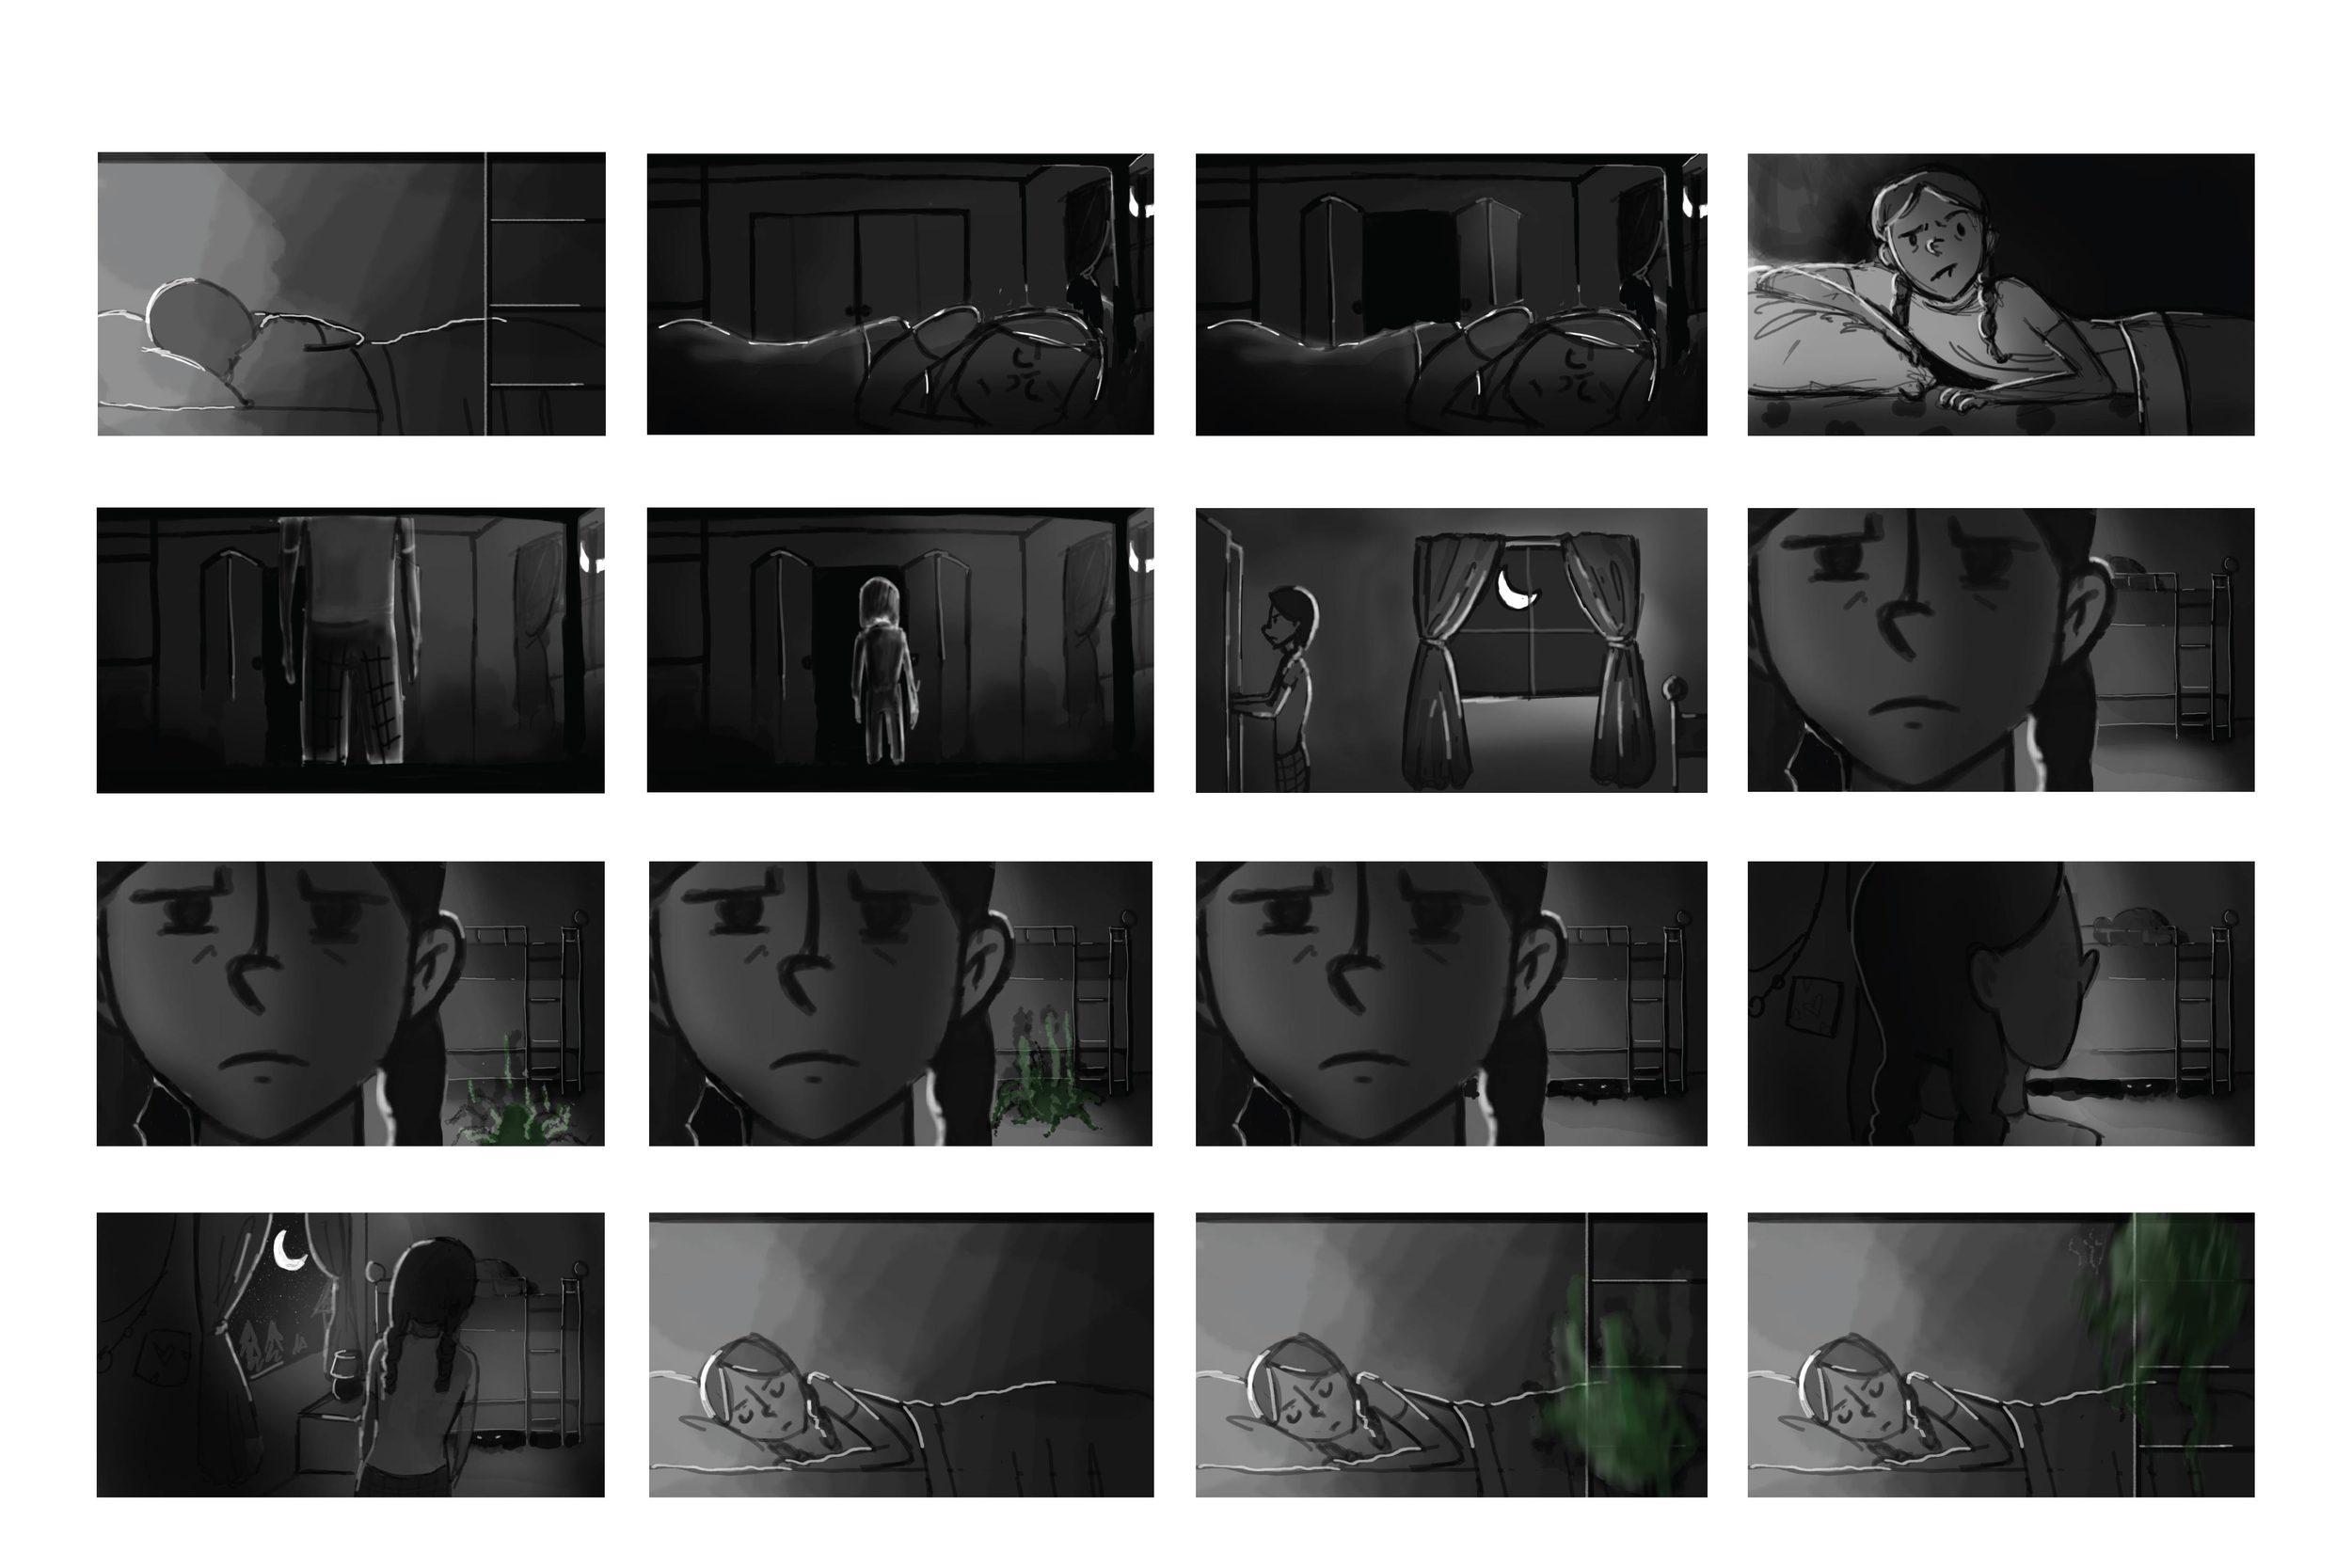 sleepover-page3-01.jpg